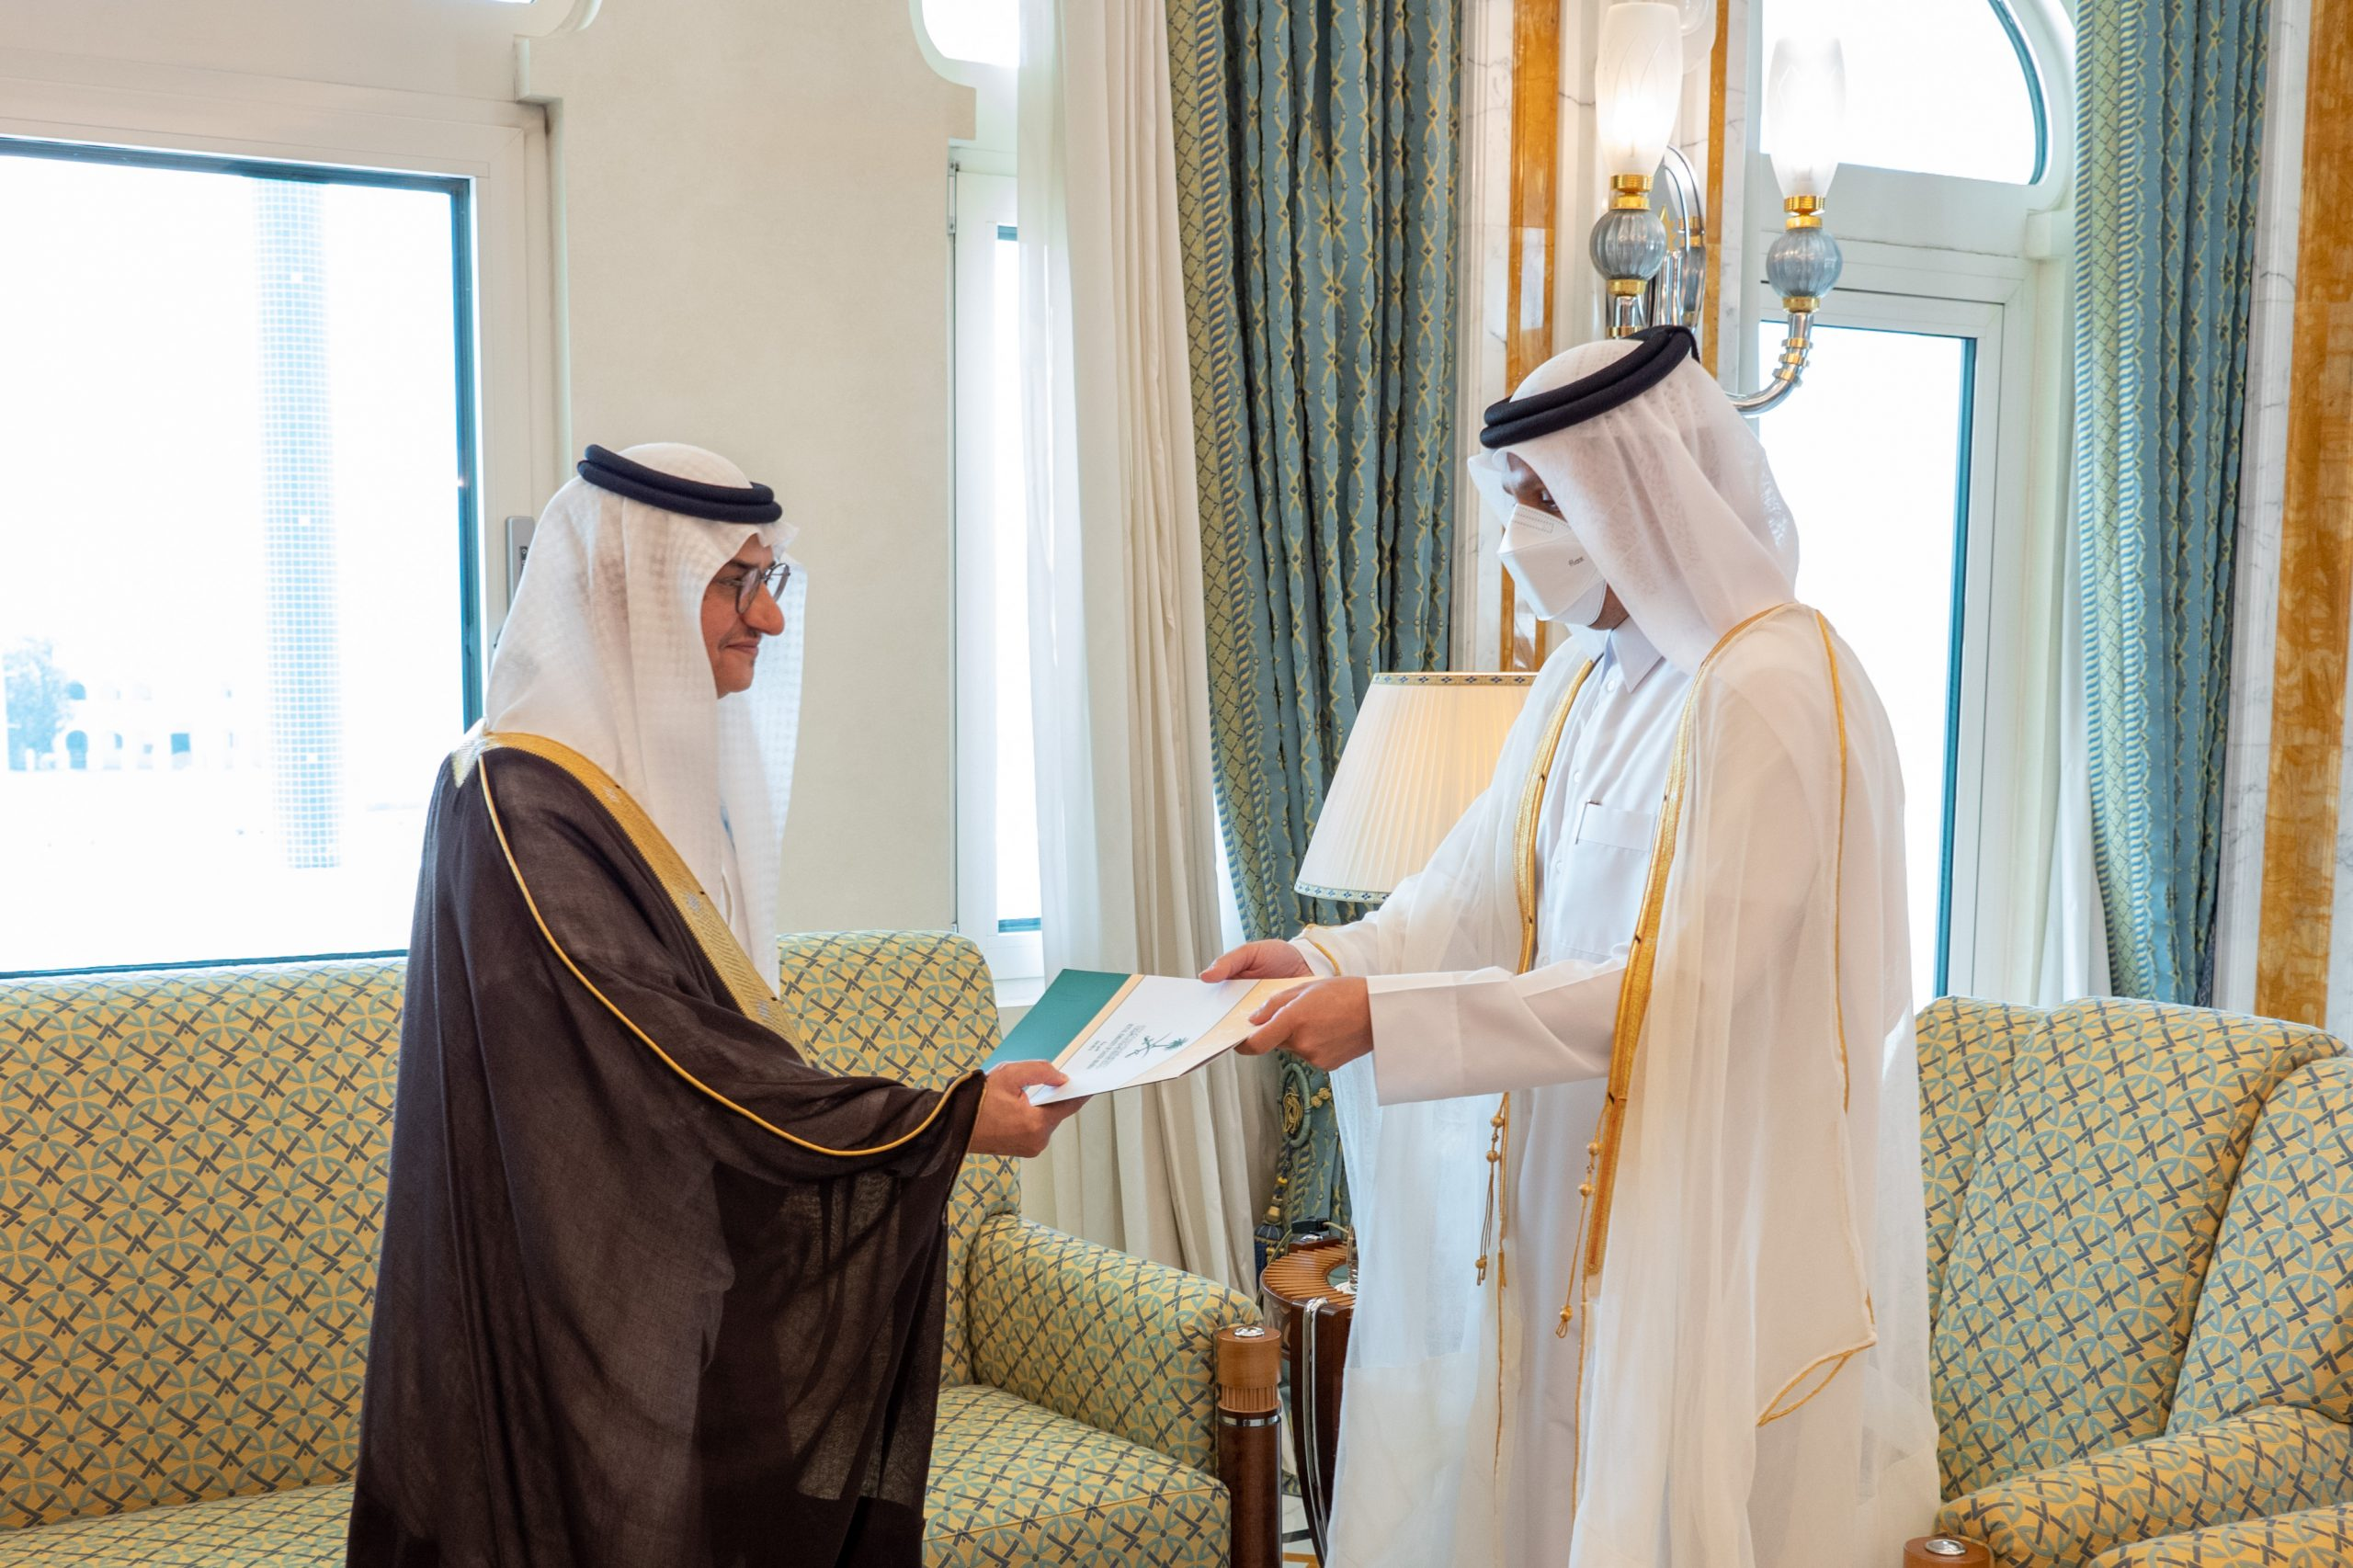 Foreign Minister Receives Copy of Credentials of Saudi Ambassador